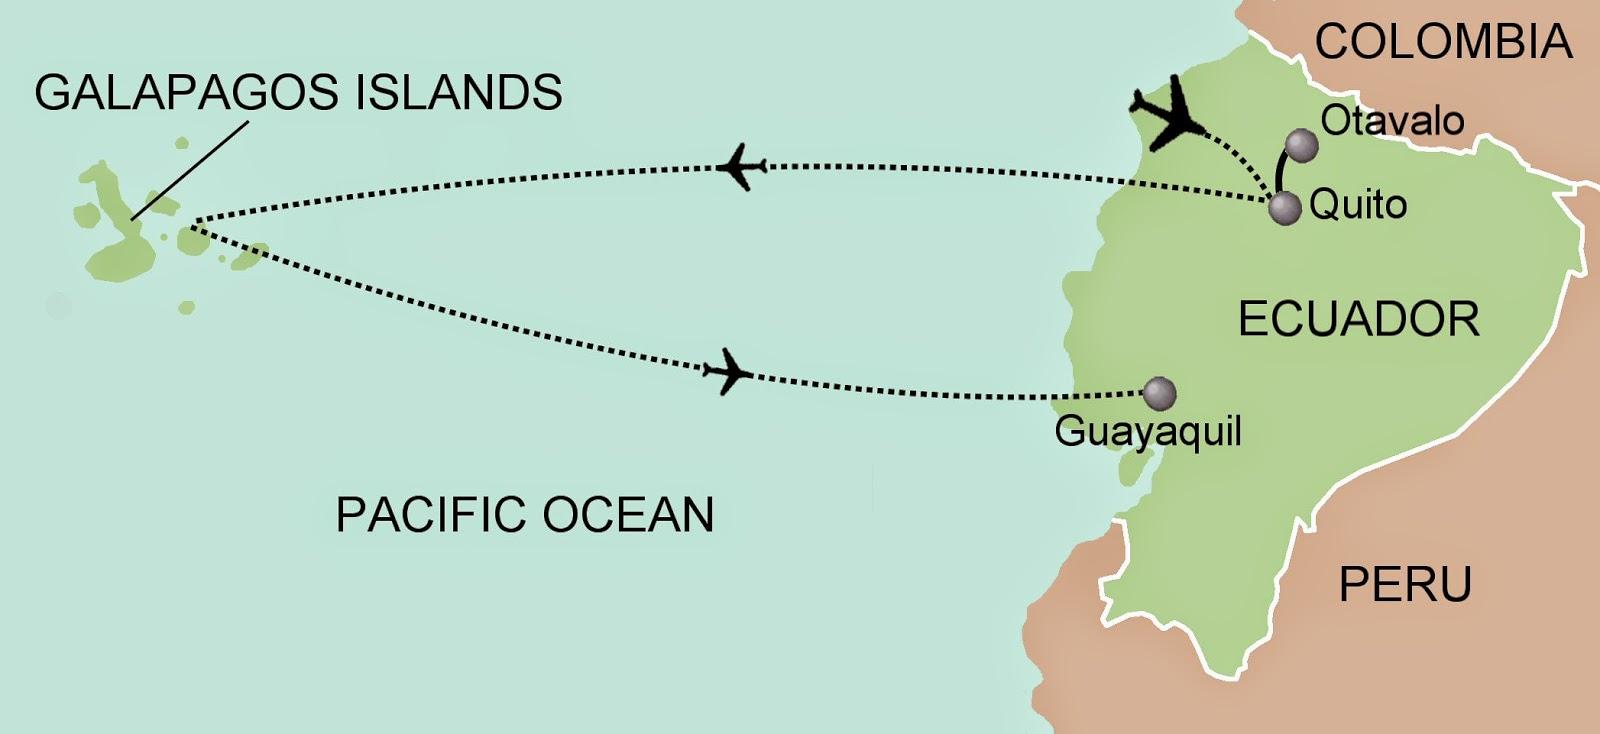 Map Galapagos Islands - Free Printable Maps on floreana island, lesser antilles map, bahamas map, pinta island, puerto rico map, japan map, greenland map, pampas map, ha long bay, yucatan peninsula map, tierra del fuego map, darwin island, bay of fundy, fernandina island, isabela island, baltra island, lake titicaca map, nameless island, patagonia map, puerto baquerizo moreno, strait of magellan map, genovesa island, puerto ayora, galapagos national park, oman map, canada map, charles darwin research station, pacific map, amazon map, cuba map, cape horn map, falklands map, ecuador map, brazilian highlands map,